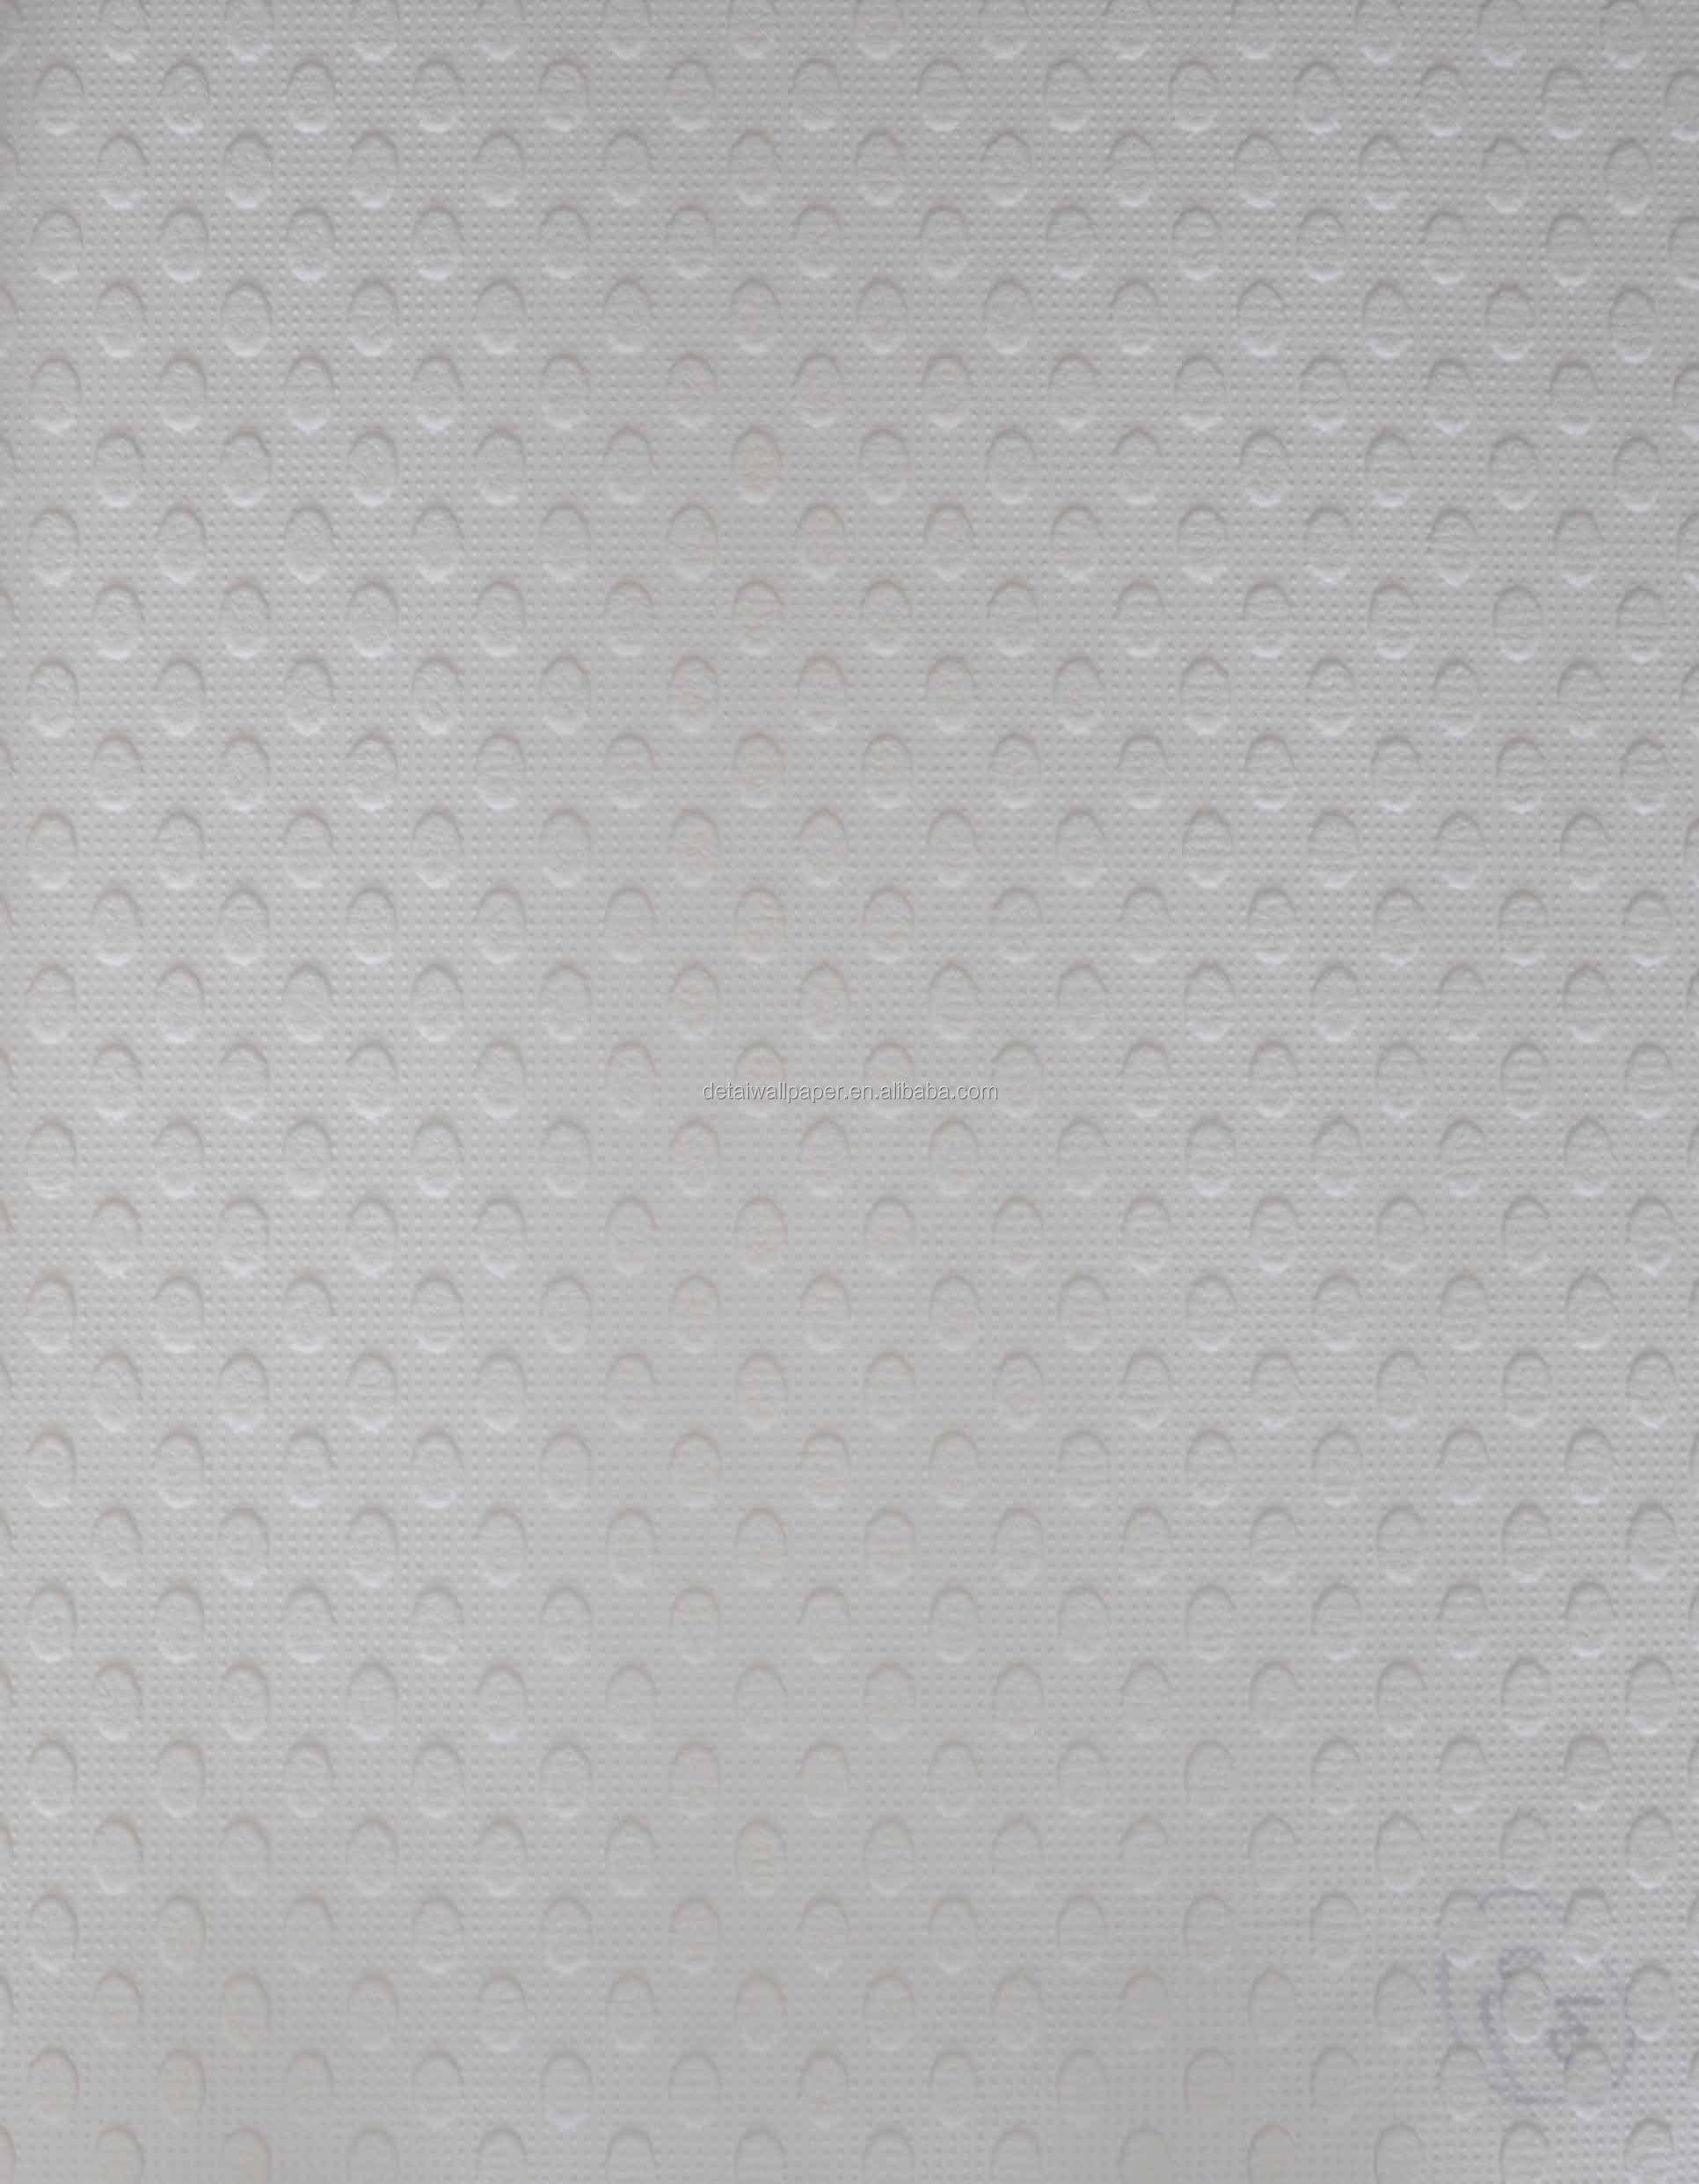 detai paintable wallpaper 3d style big size 1.06m width - buy big